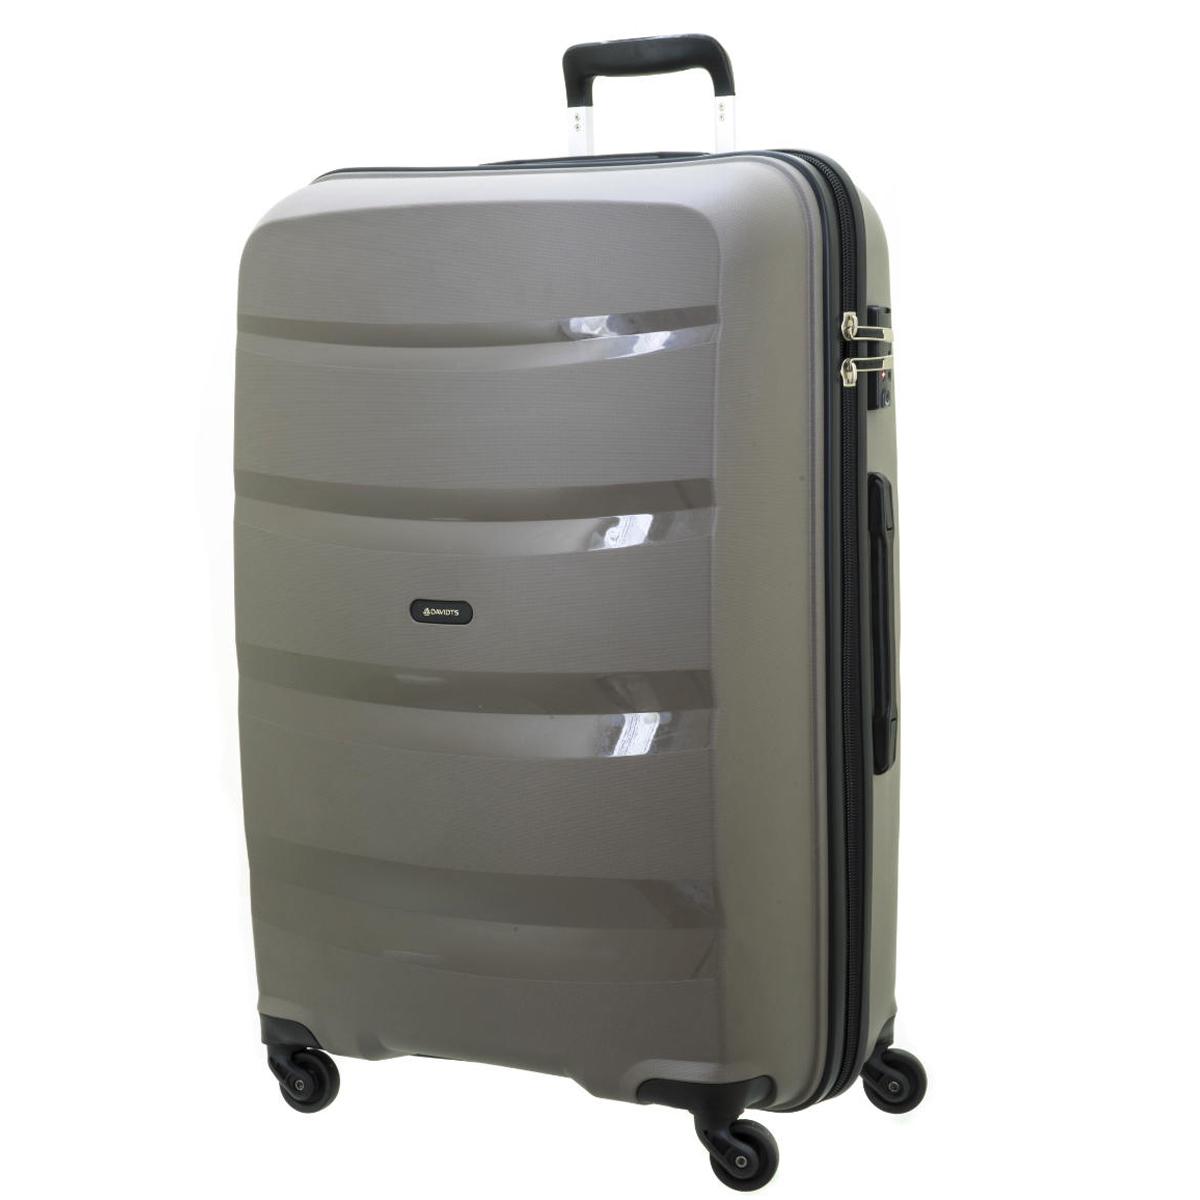 Valise trolley coque polypropylène \'Davidt\'s\' gris taupe - 74x49x30 cm - [Q0636]